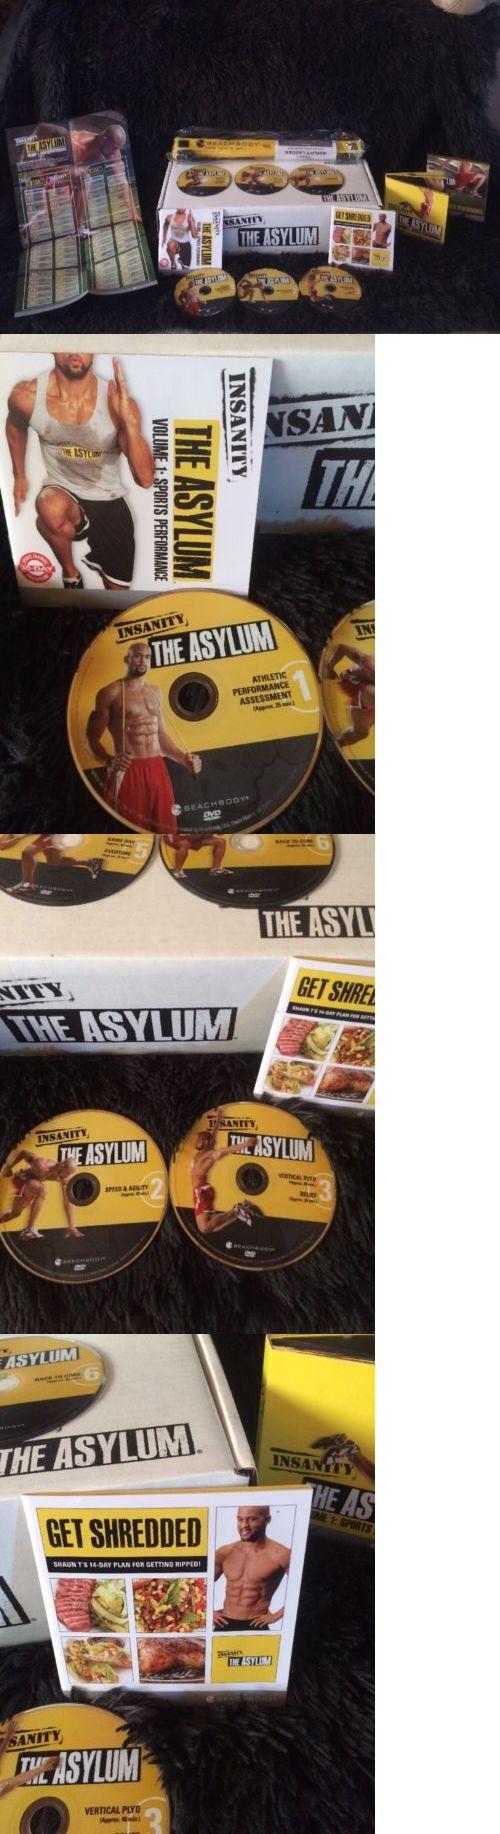 Fitness DVDs 109130: Insanity The Asylum Beachbody Workouts Dvds -> BUY IT NOW ONLY: $90 on eBay!